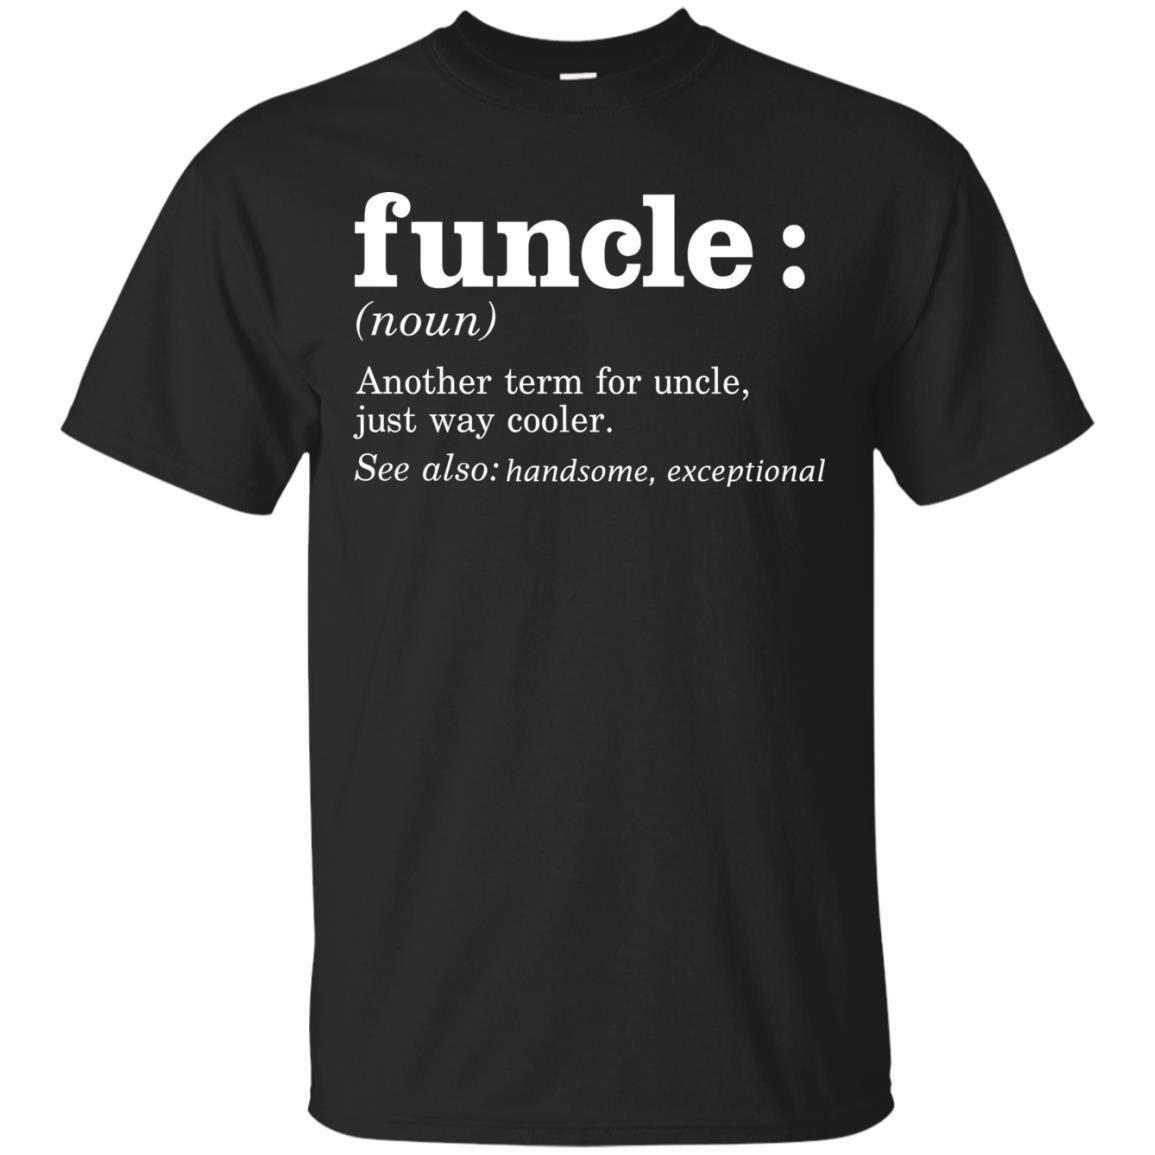 8fc81b674 Mens Funcle Shirt Cool & Funny Uncle T Shirt Funny Unisex Tshirt Top  Political T Shirts Cotton T Shirt From Handdrawntees, $12.96| DHgate.Com